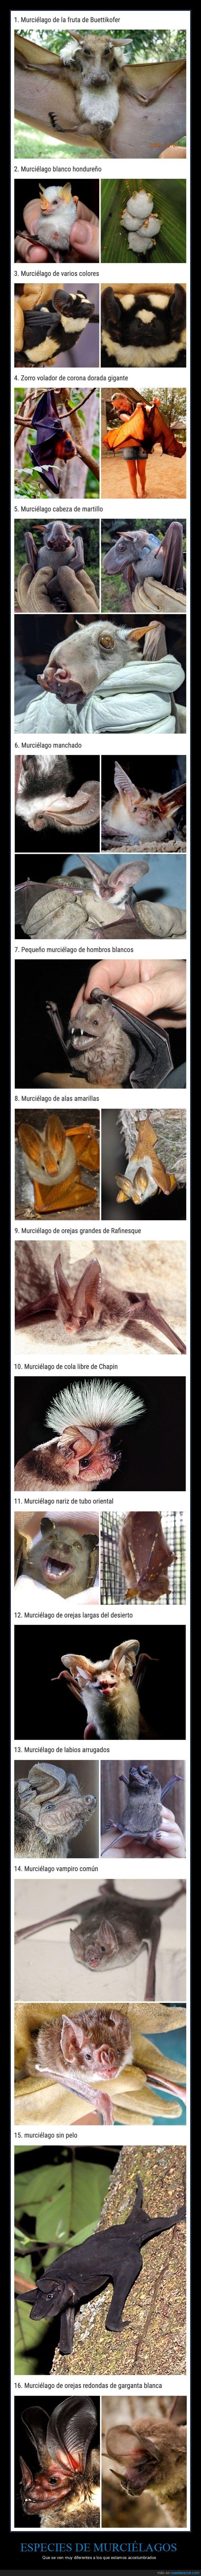 curiosidades,murciélagos